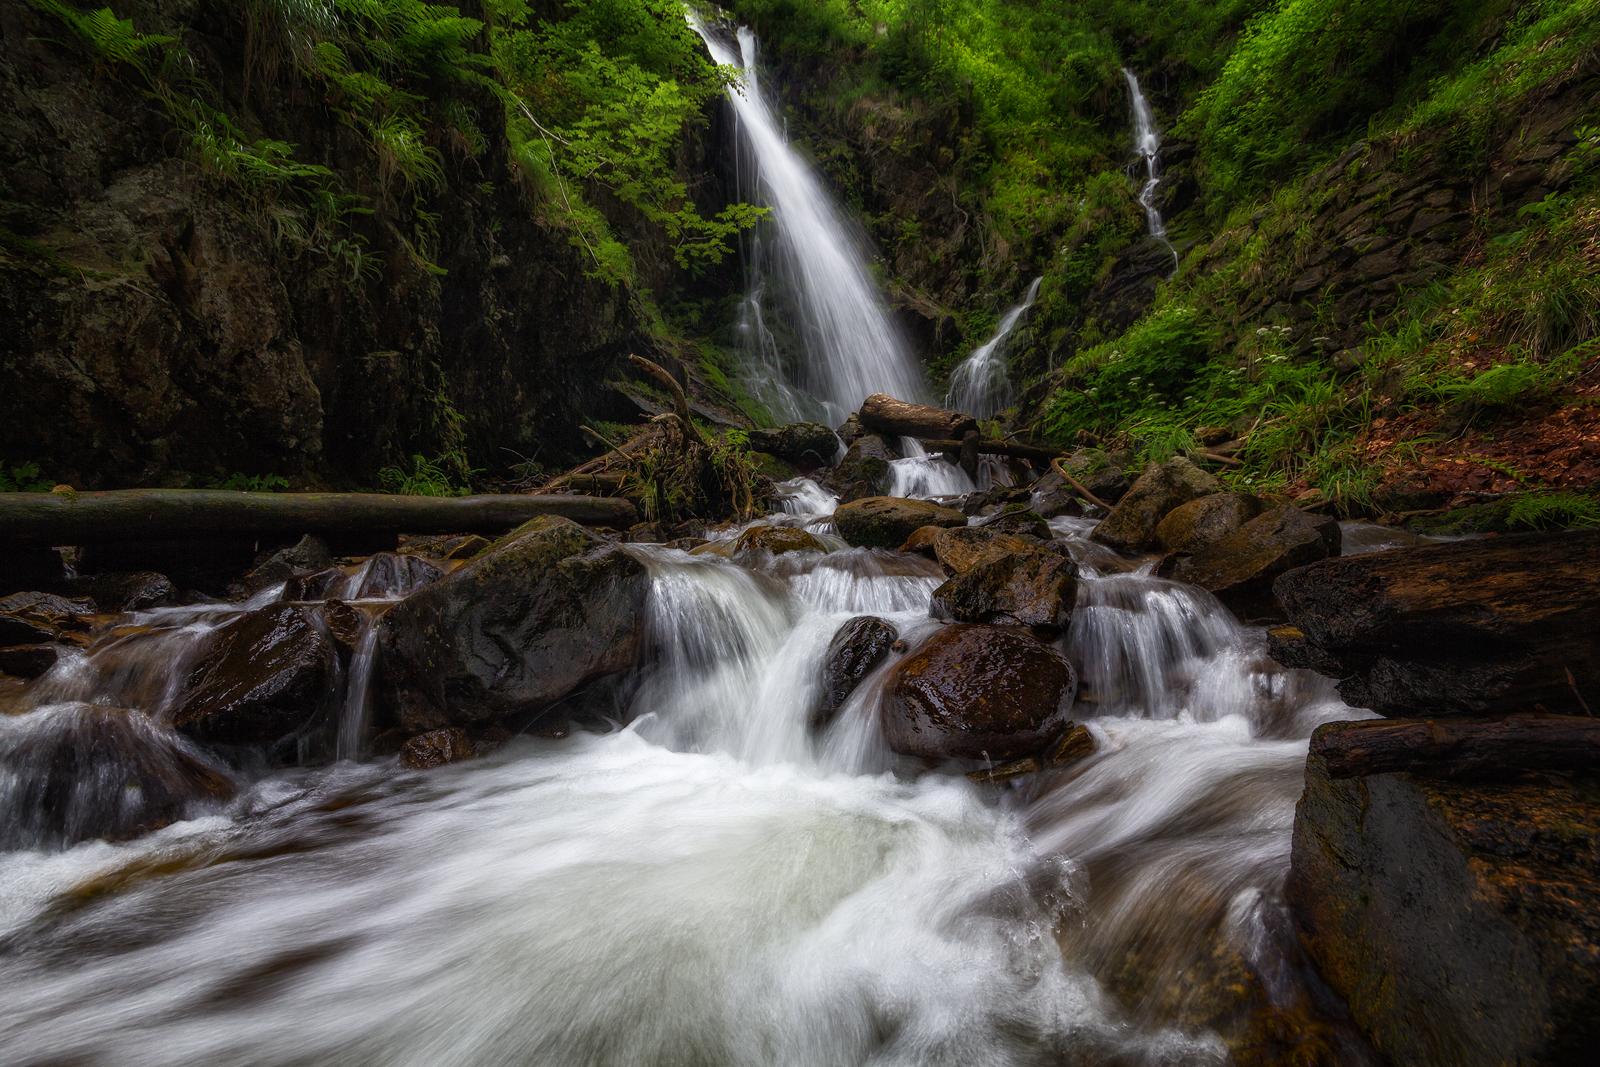 Fahler Wasserfall, Germany